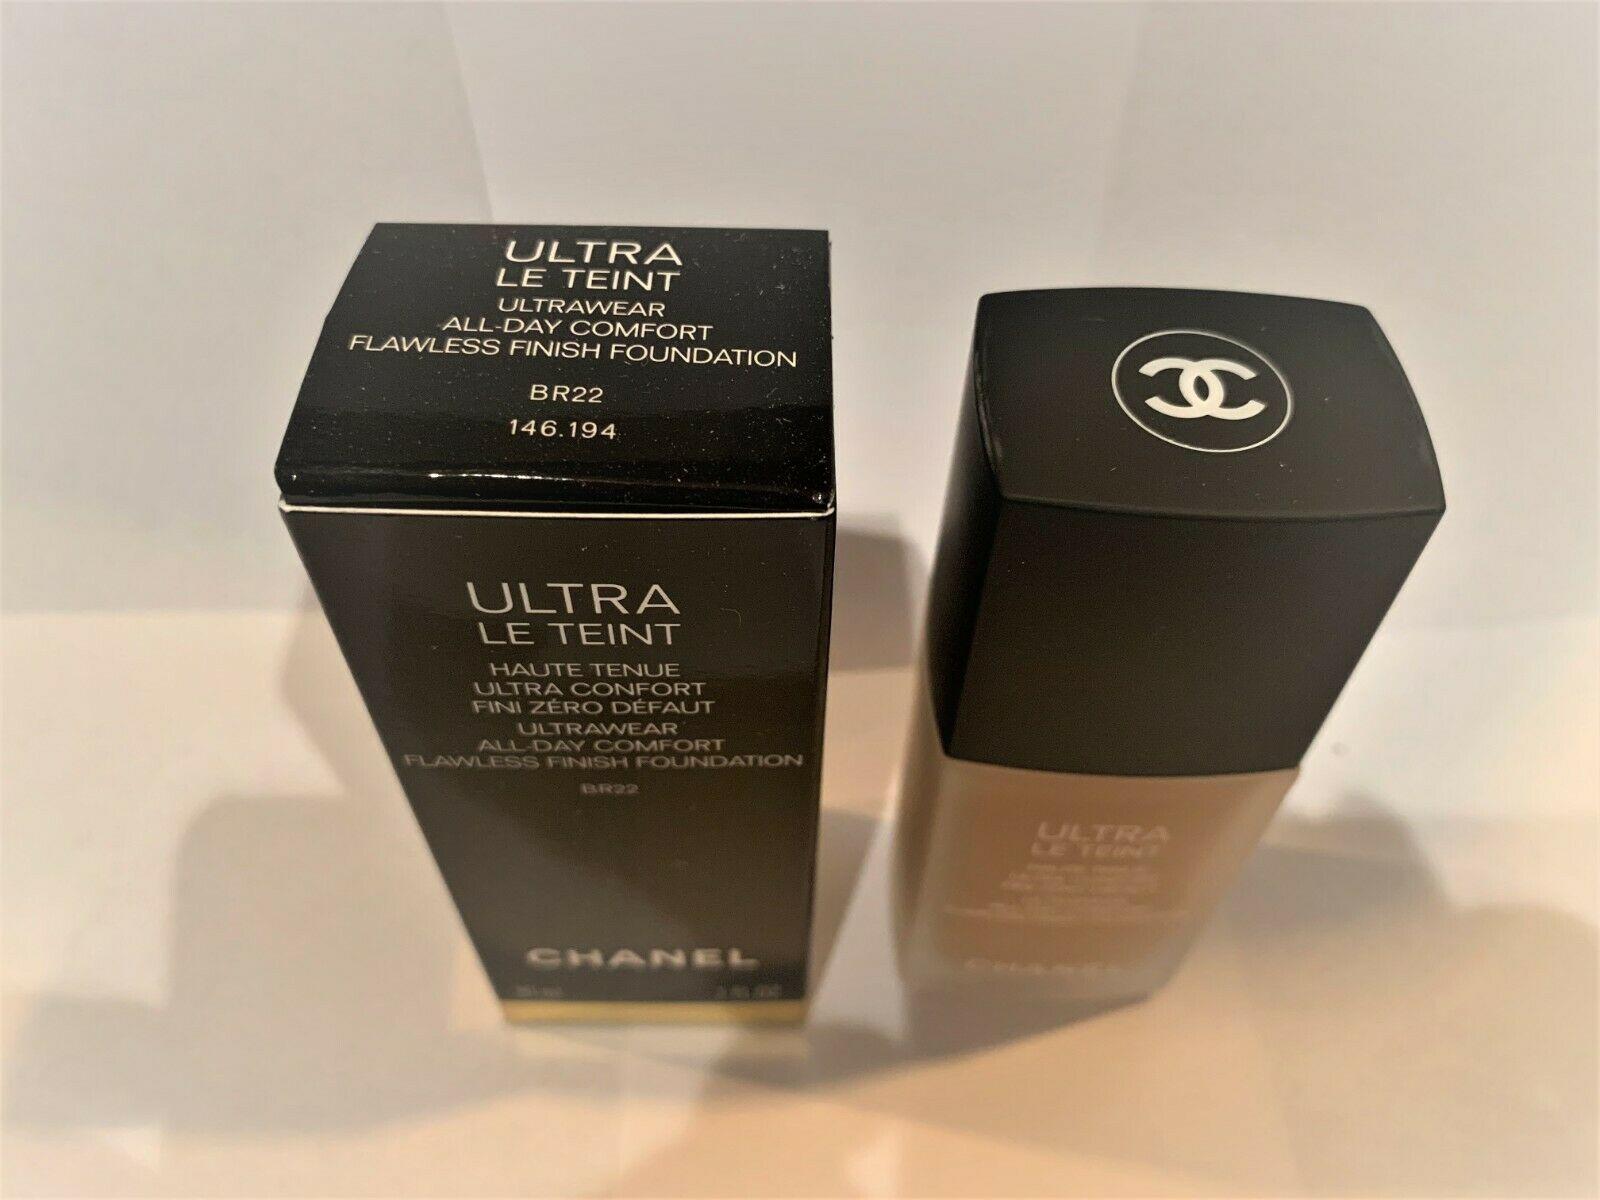 ULTRA LE TEINT CHANEL all day  flawless finish foundation 30ML COLOR BR22 BNIB - $57.95